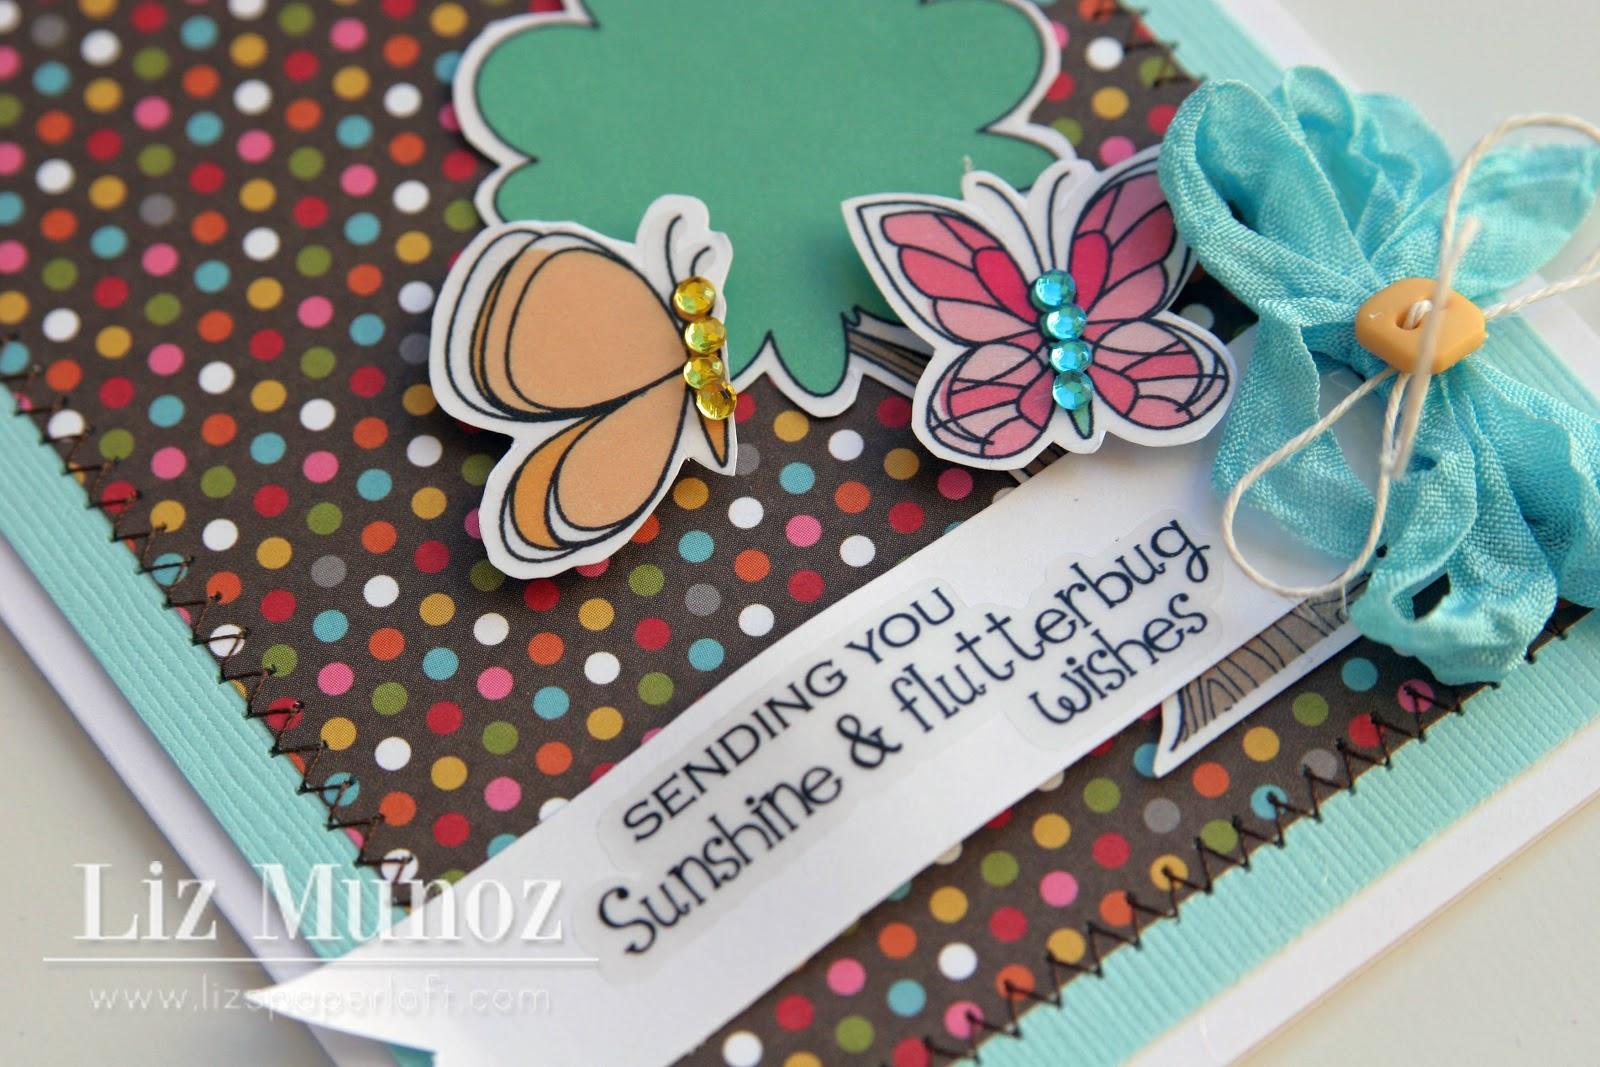 #9C352F Liz's Paper Loft: Goodbye EAD Designs Hop ~ Card 1600x1067 píxeis em Curso Design Ead